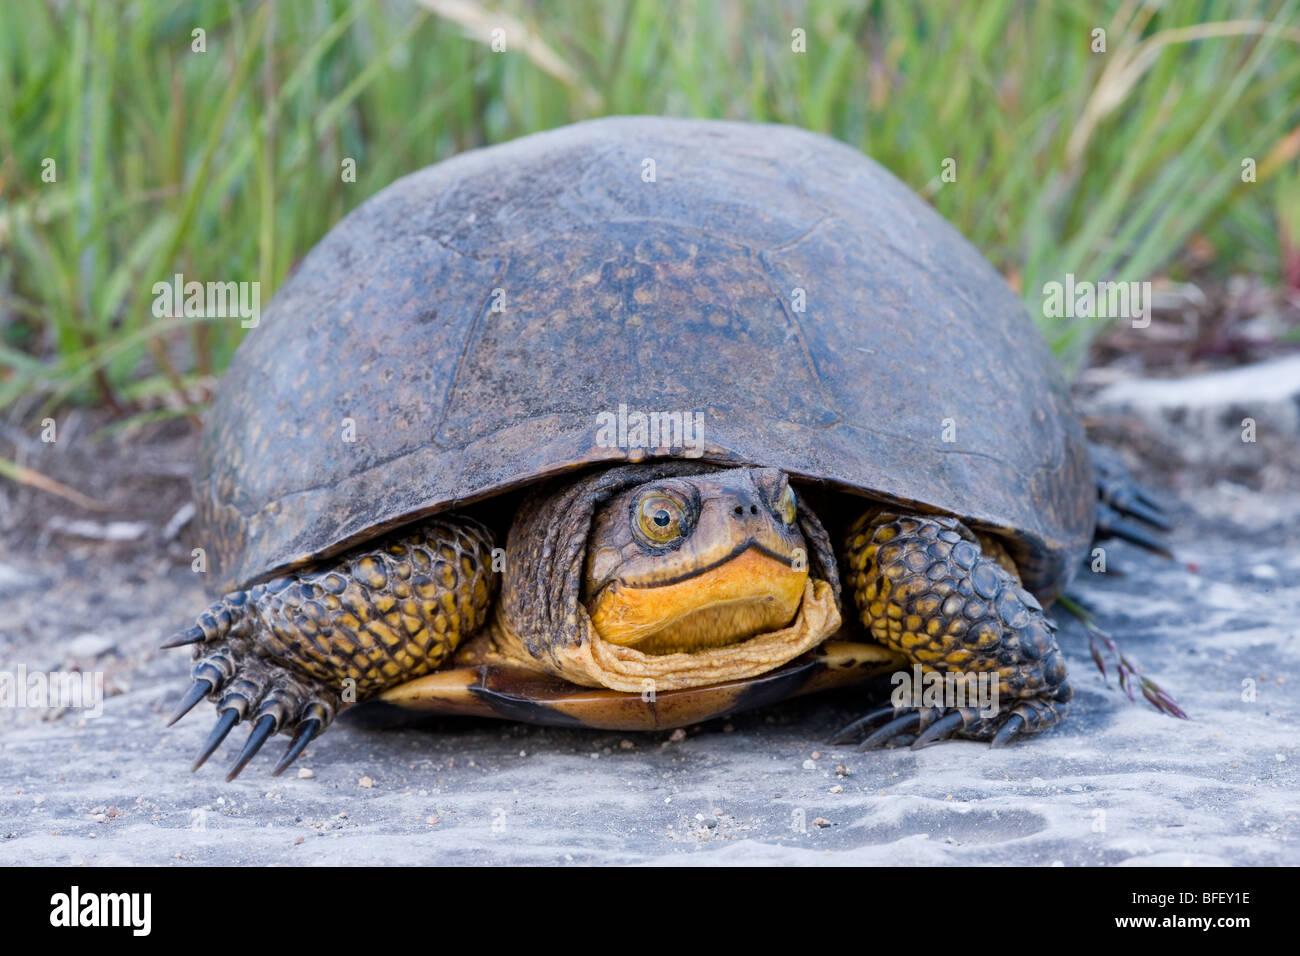 Blanding's Turtle (Emydoidea blandingii) (Endangered in Nova Scotia; Threatened in Great Lakes/St. Lawrence) - Stock Image